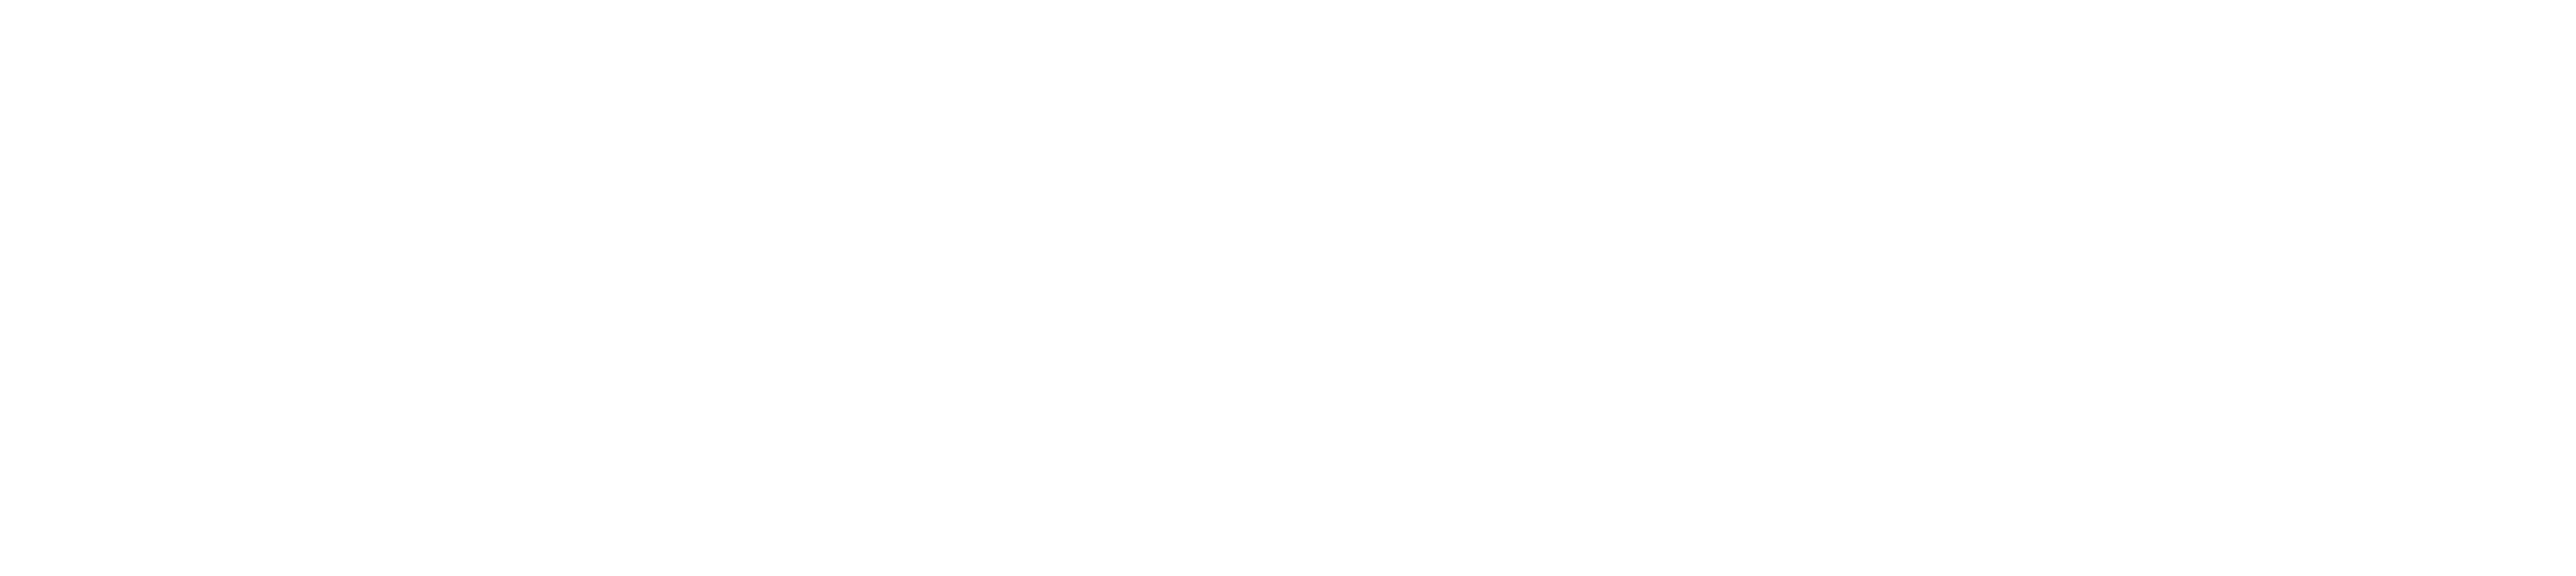 Looney & Associates logo